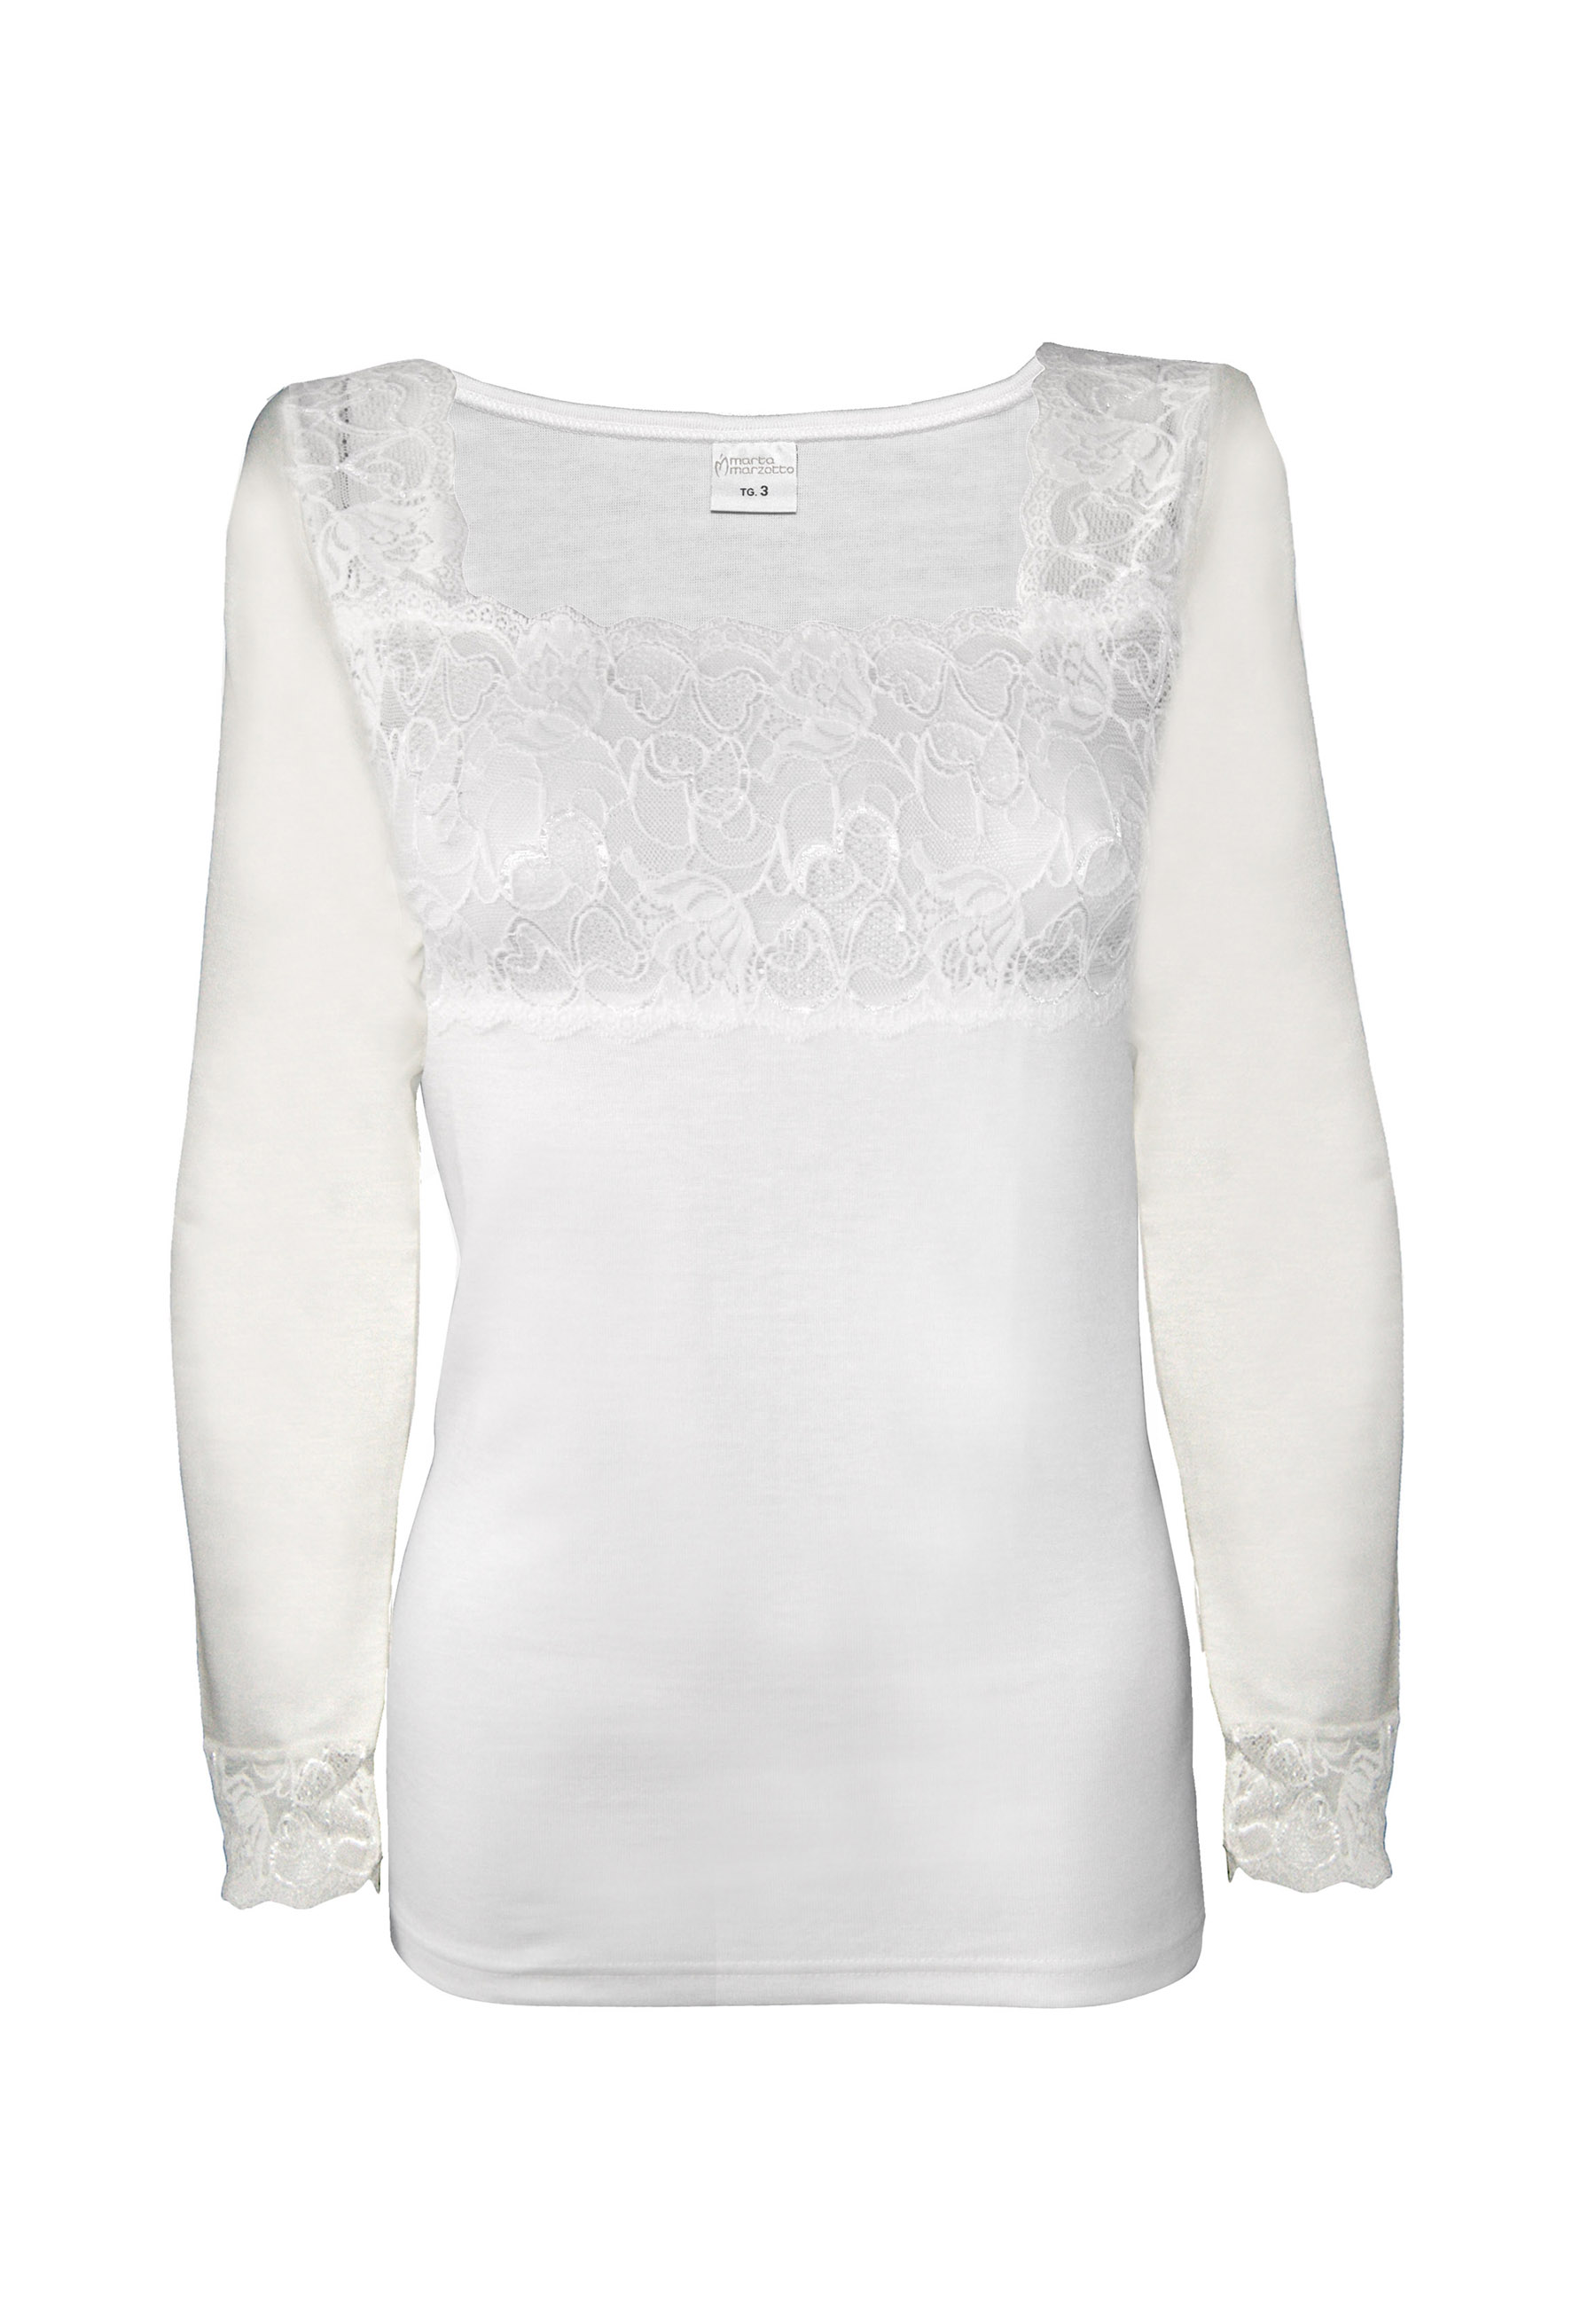 d4511c58230 Ισοθερμική μπλούζα μαλλί+ βαμβάκι MARTA MARZOTTO μόνο στο BUSTO